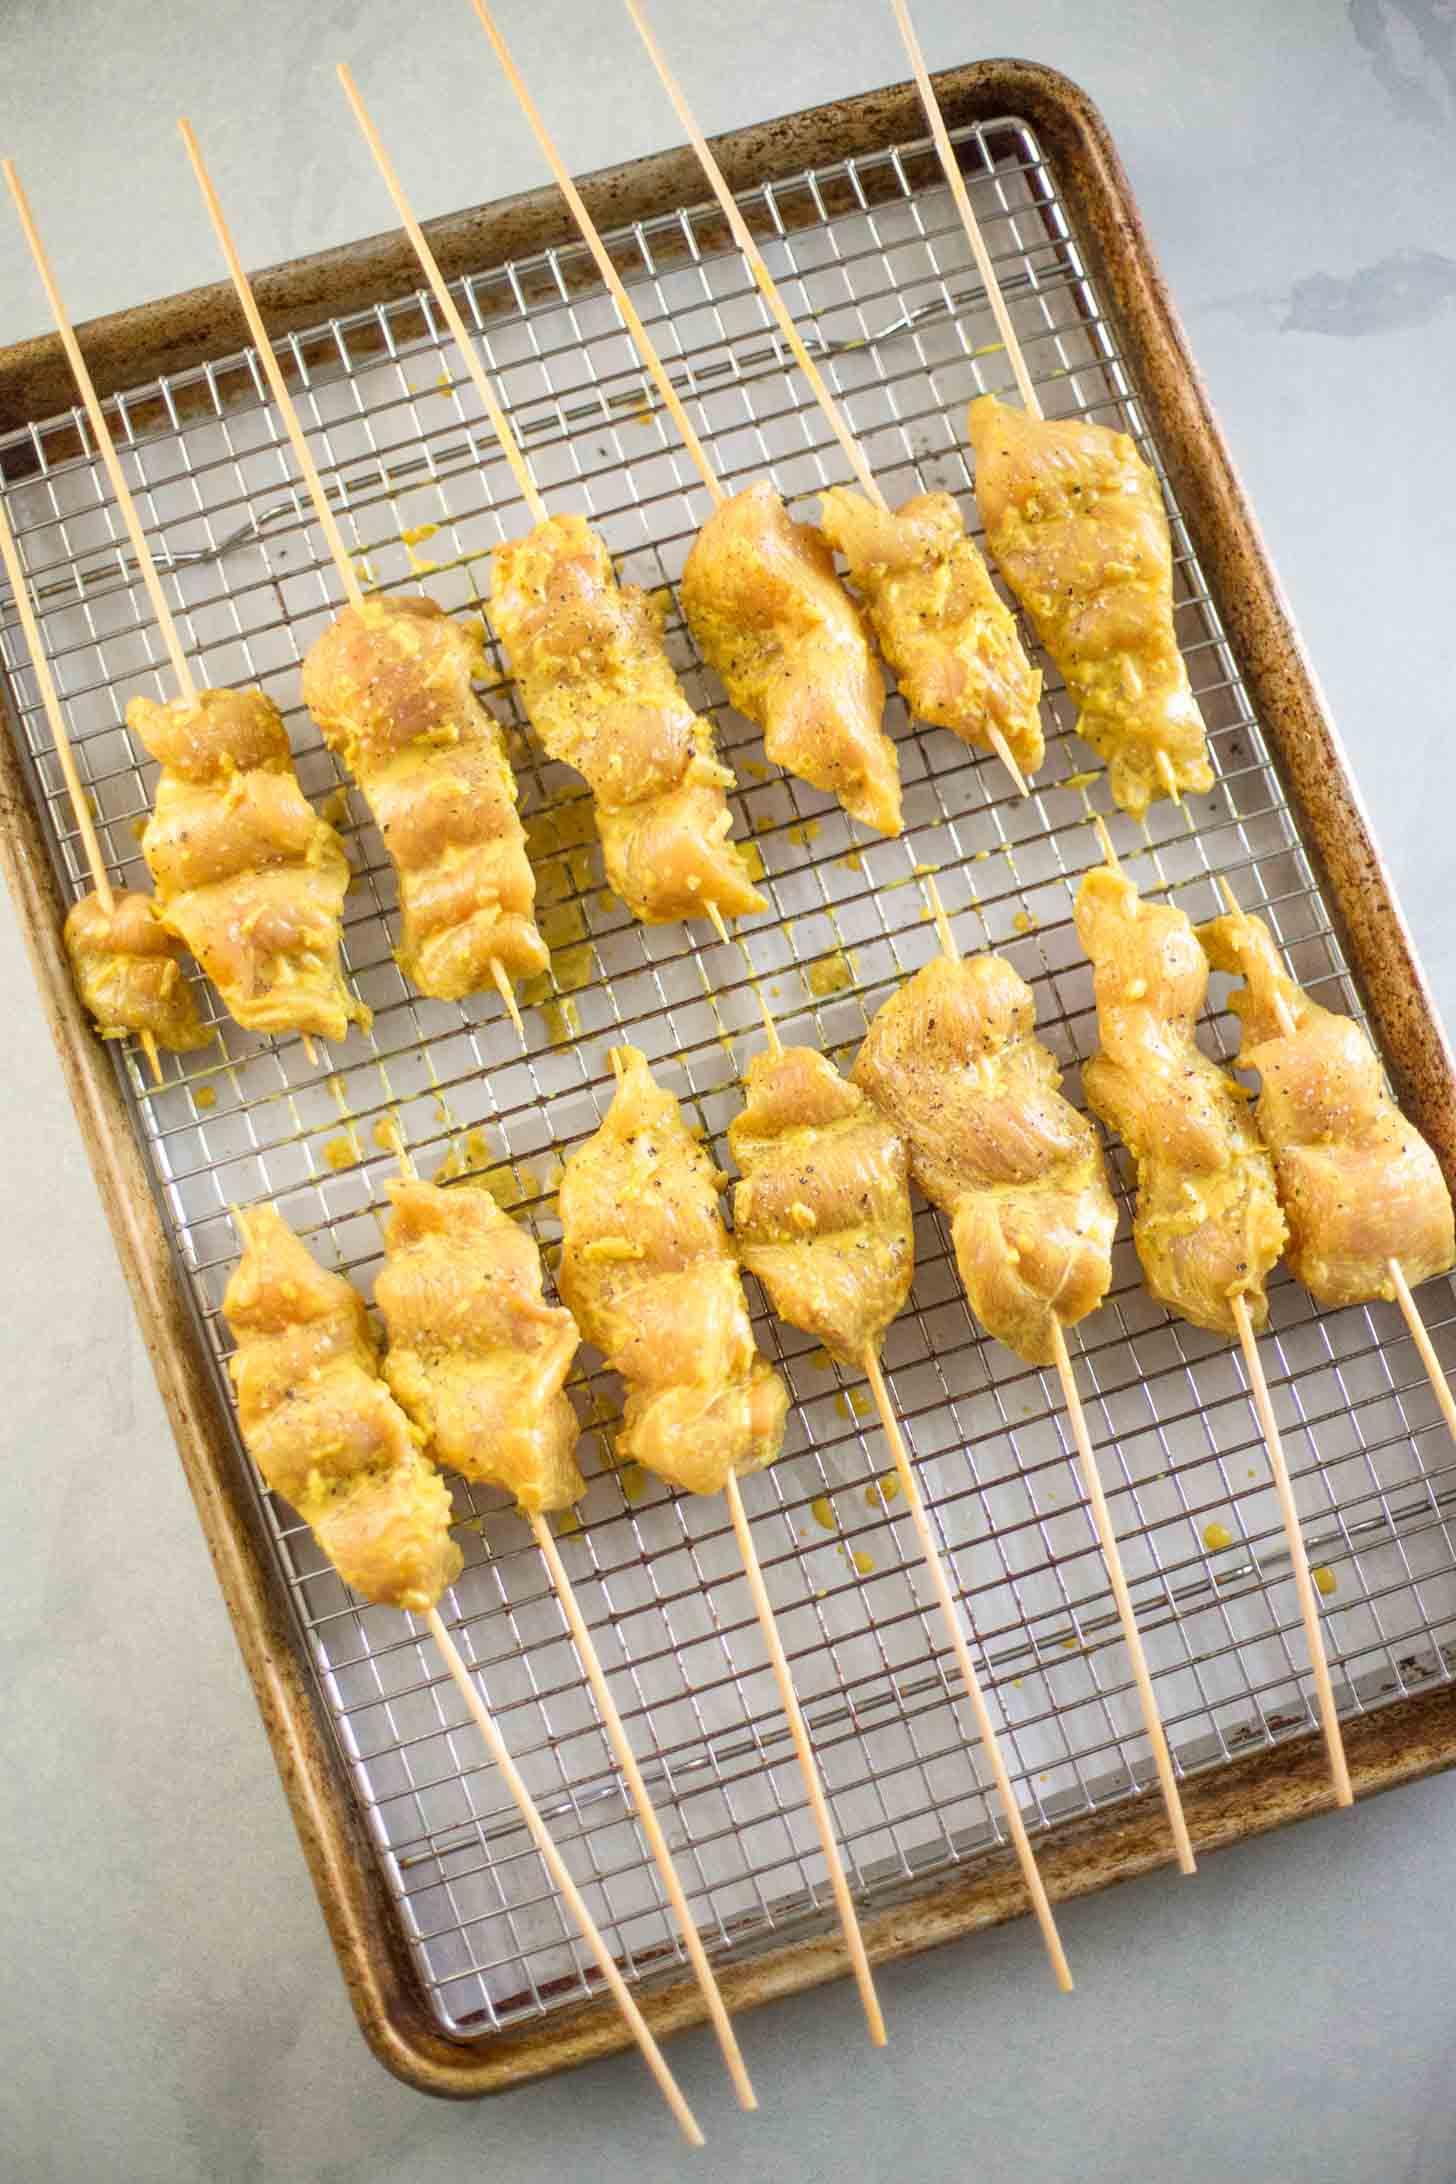 chicken satay on skewers on a sheet pan